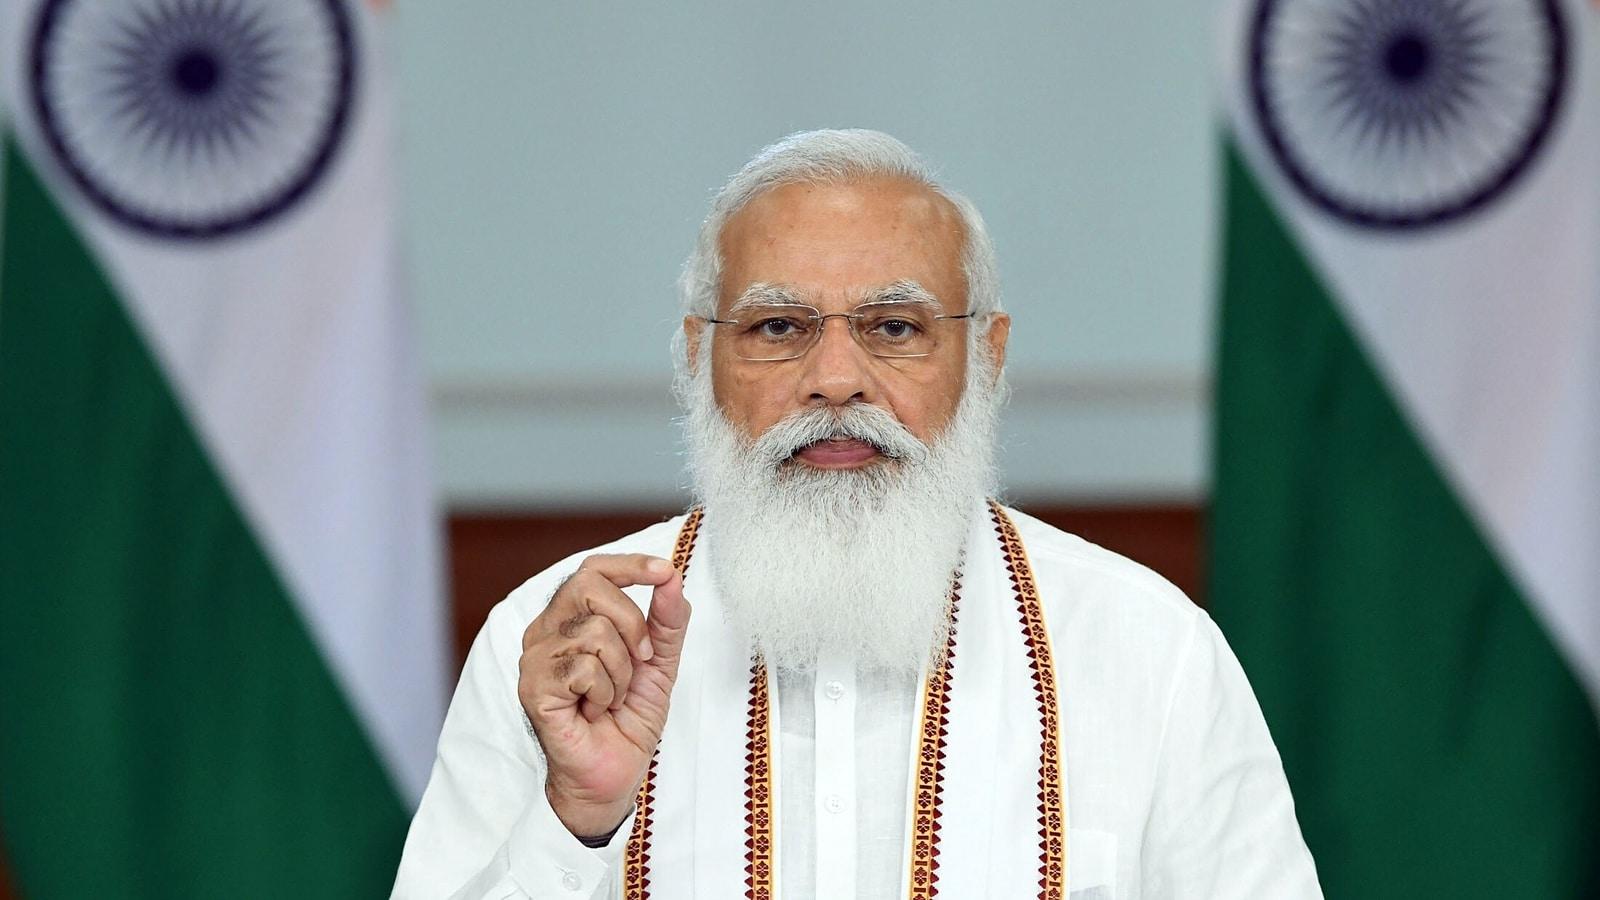 Kargil Vijay Diwas: PM Modi pays tribute, says 'we remember their sacrifices'